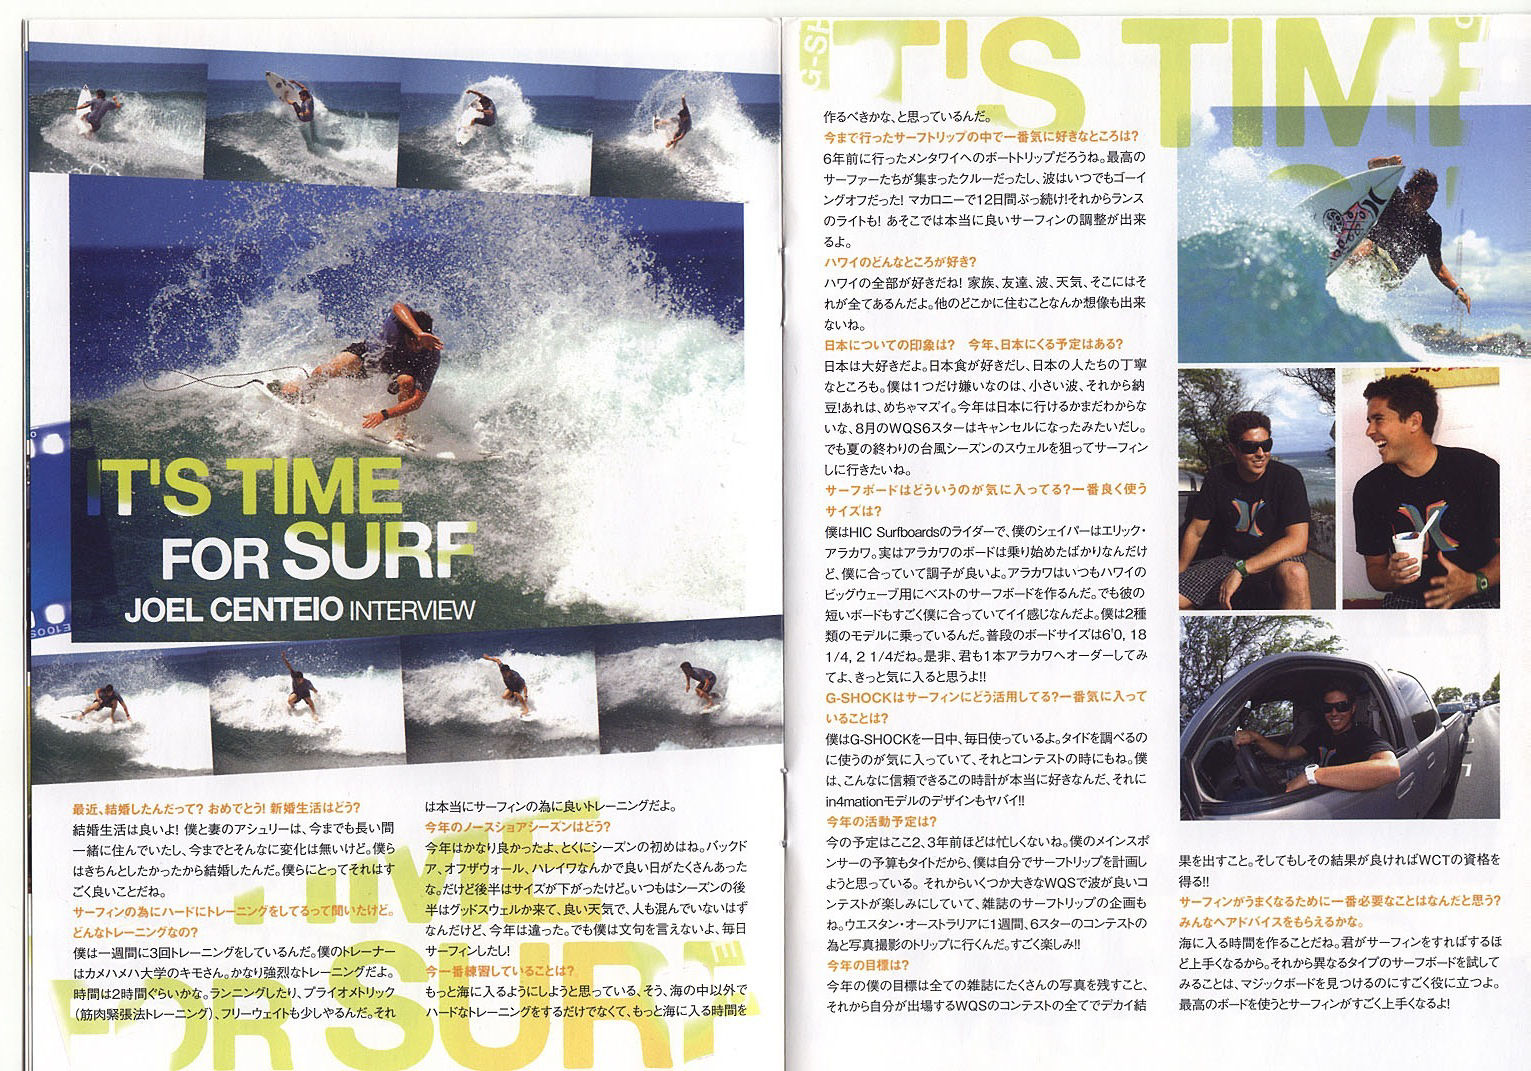 Casio-G-Shock-Surf-Collection-Summer-2009-Page-4.jpg